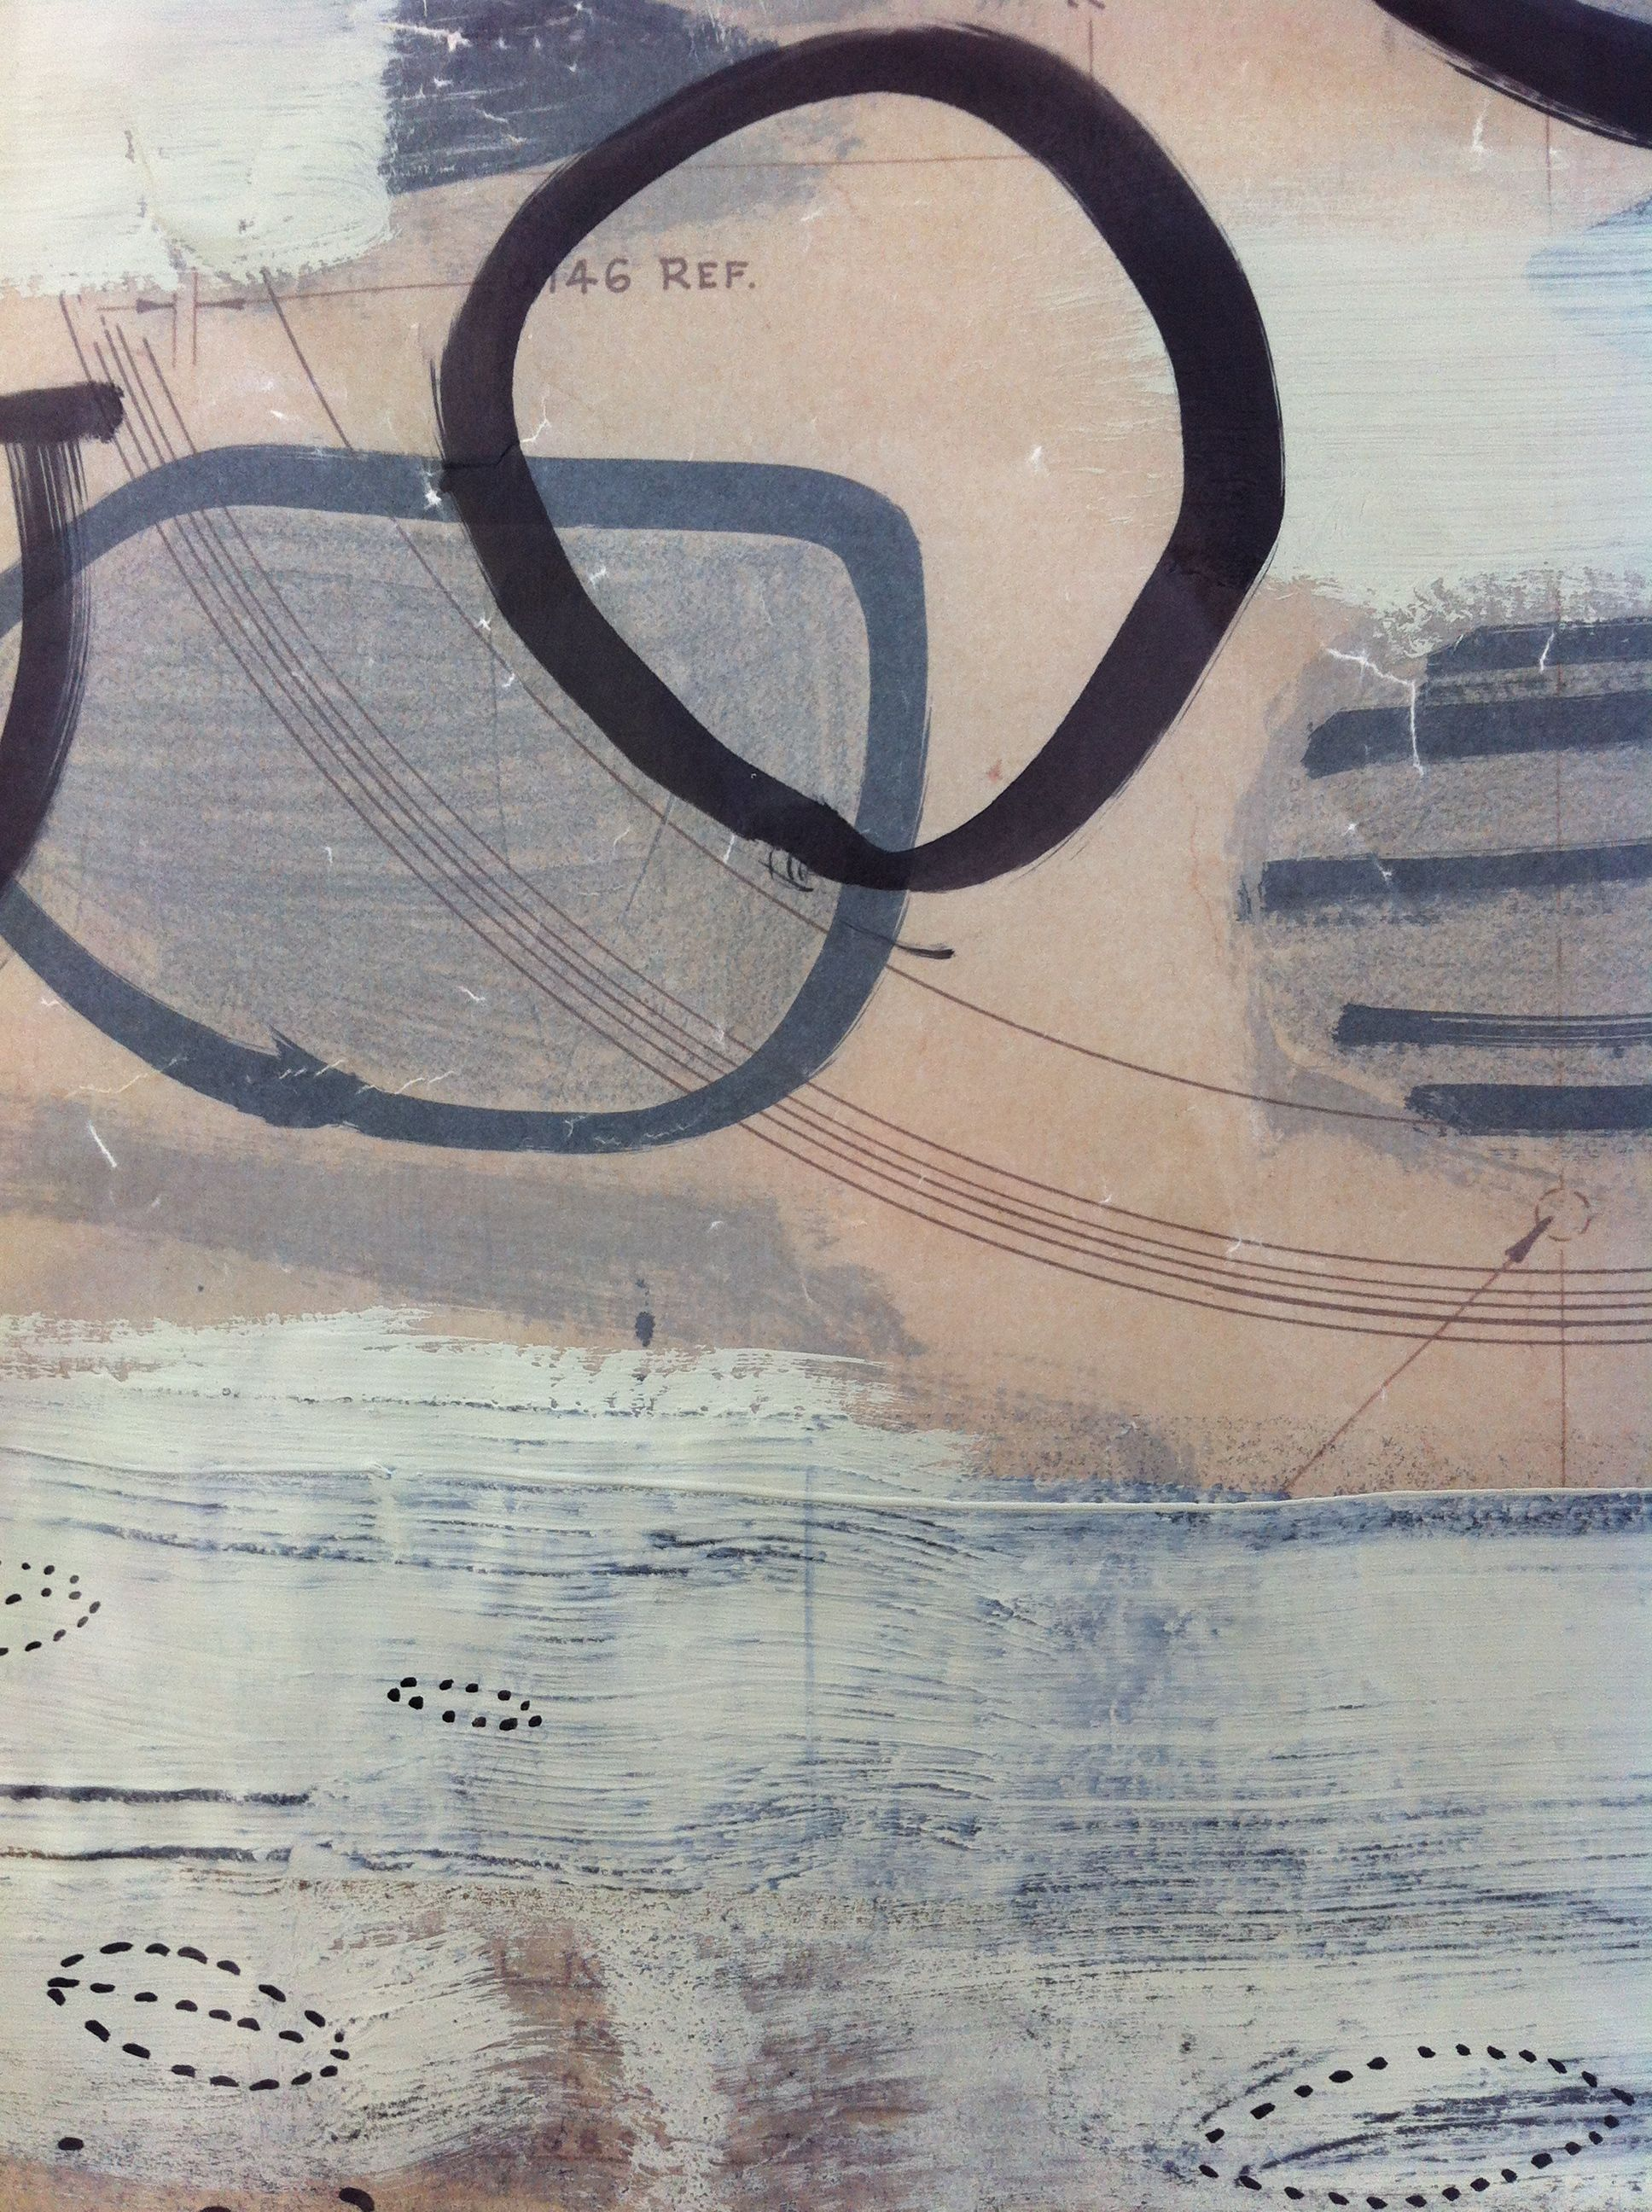 ink, drafting film and graphite  Lorna Crane